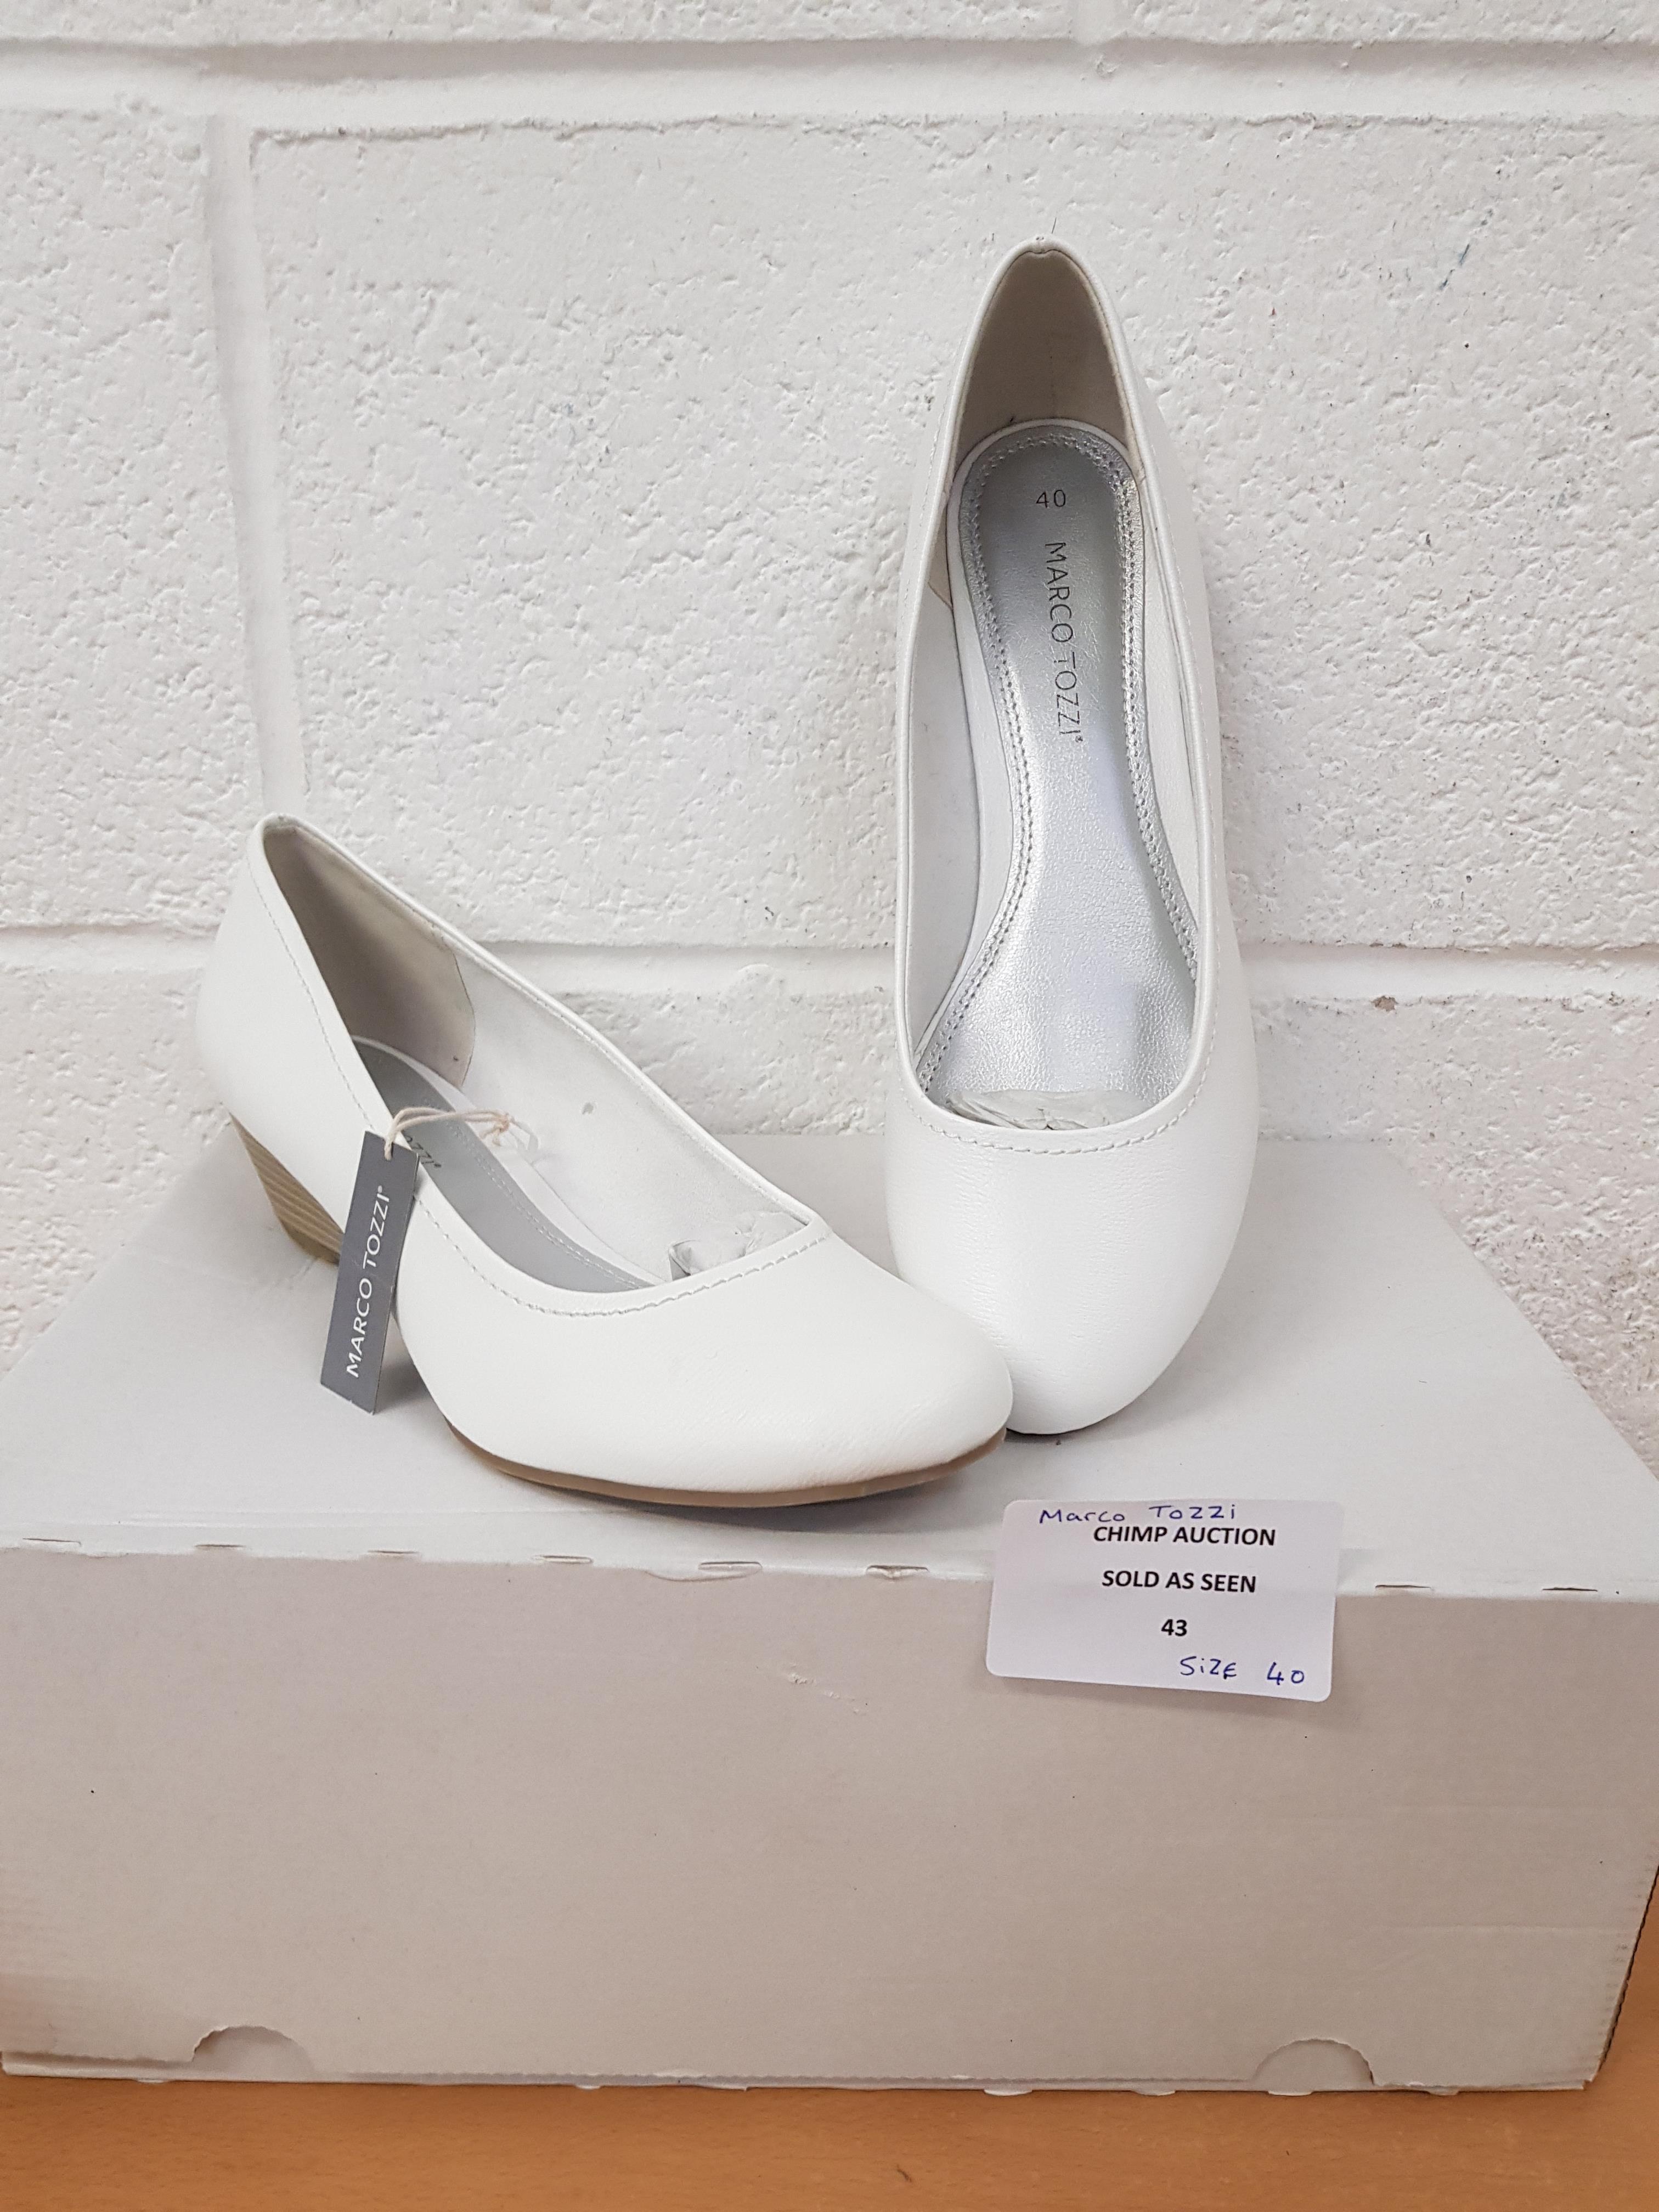 Lot 43 - Marco Tozzi ladies shoes EU 40